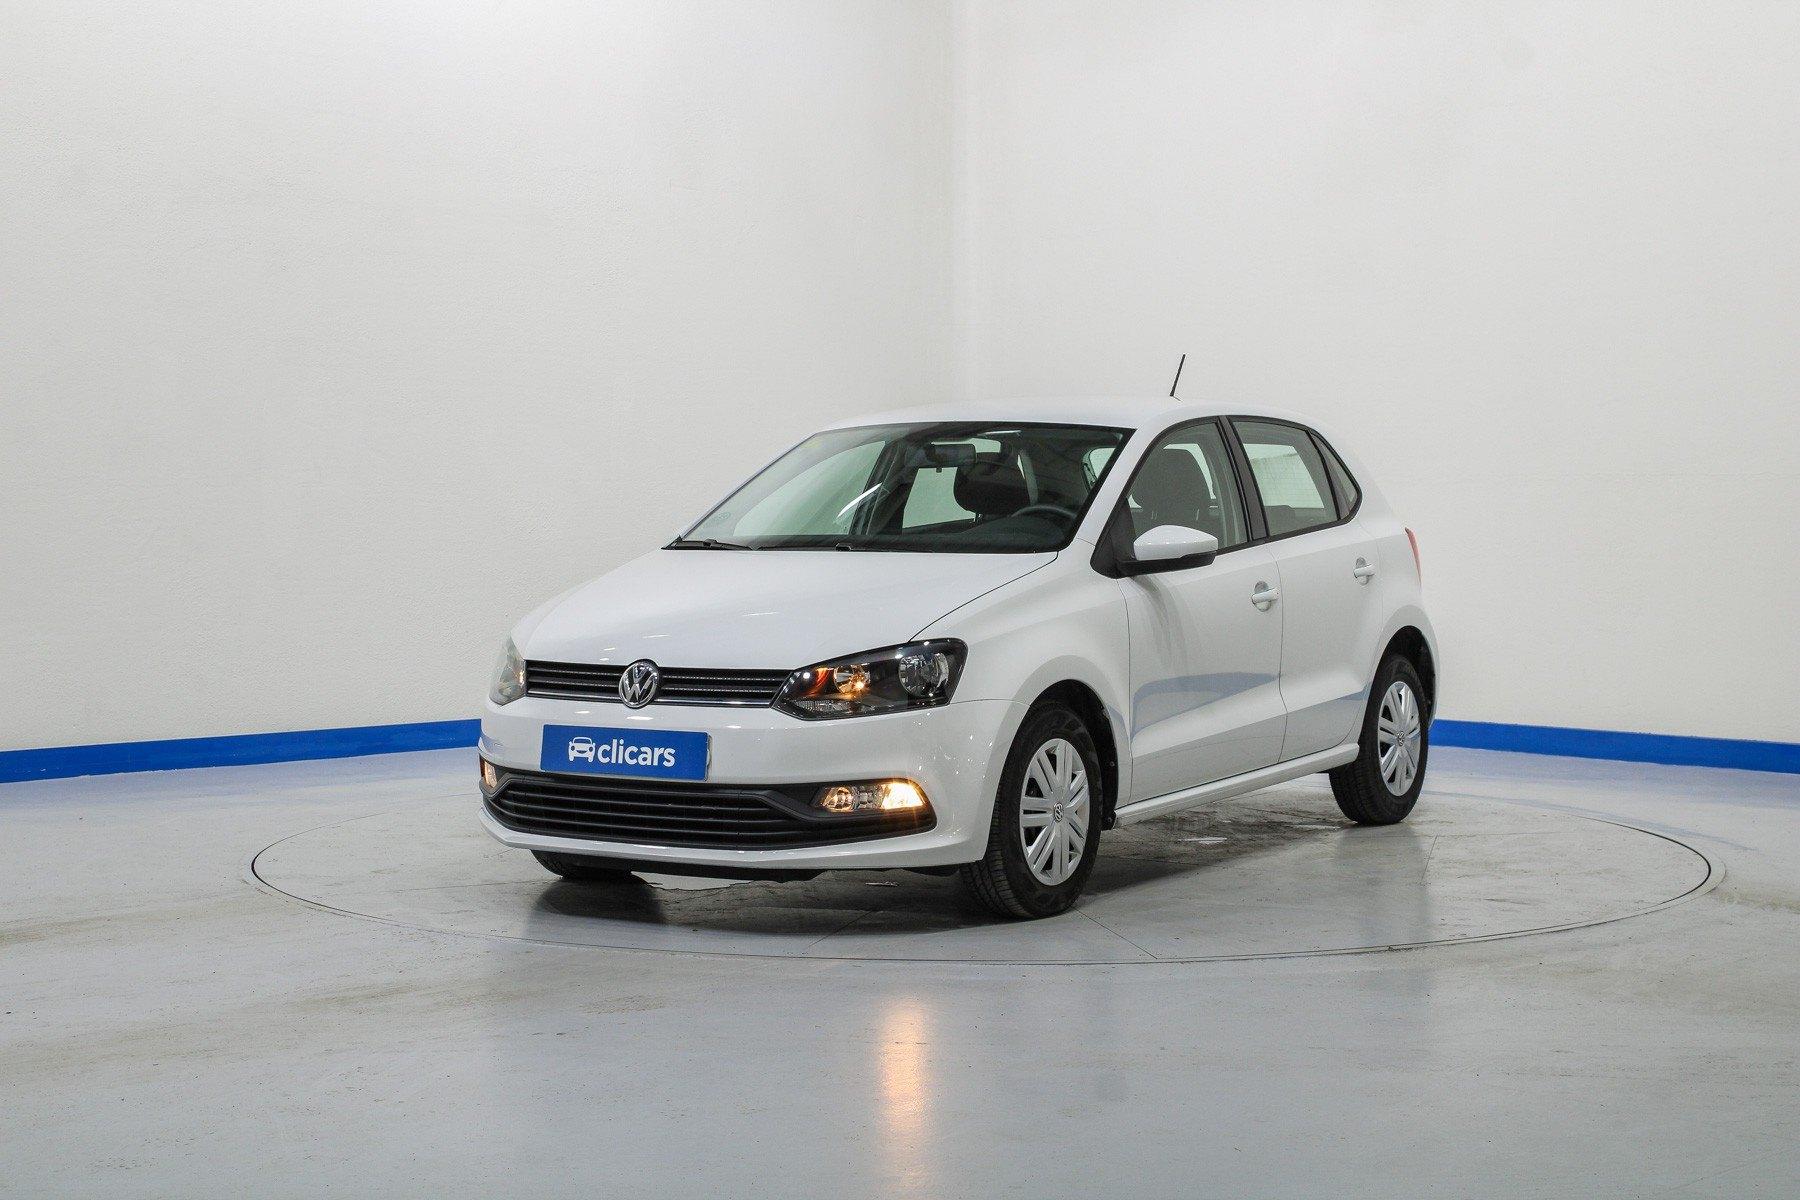 Volkswagen Polo Diésel Edition 1.4 TDI 55kW (75CV) BMT 1